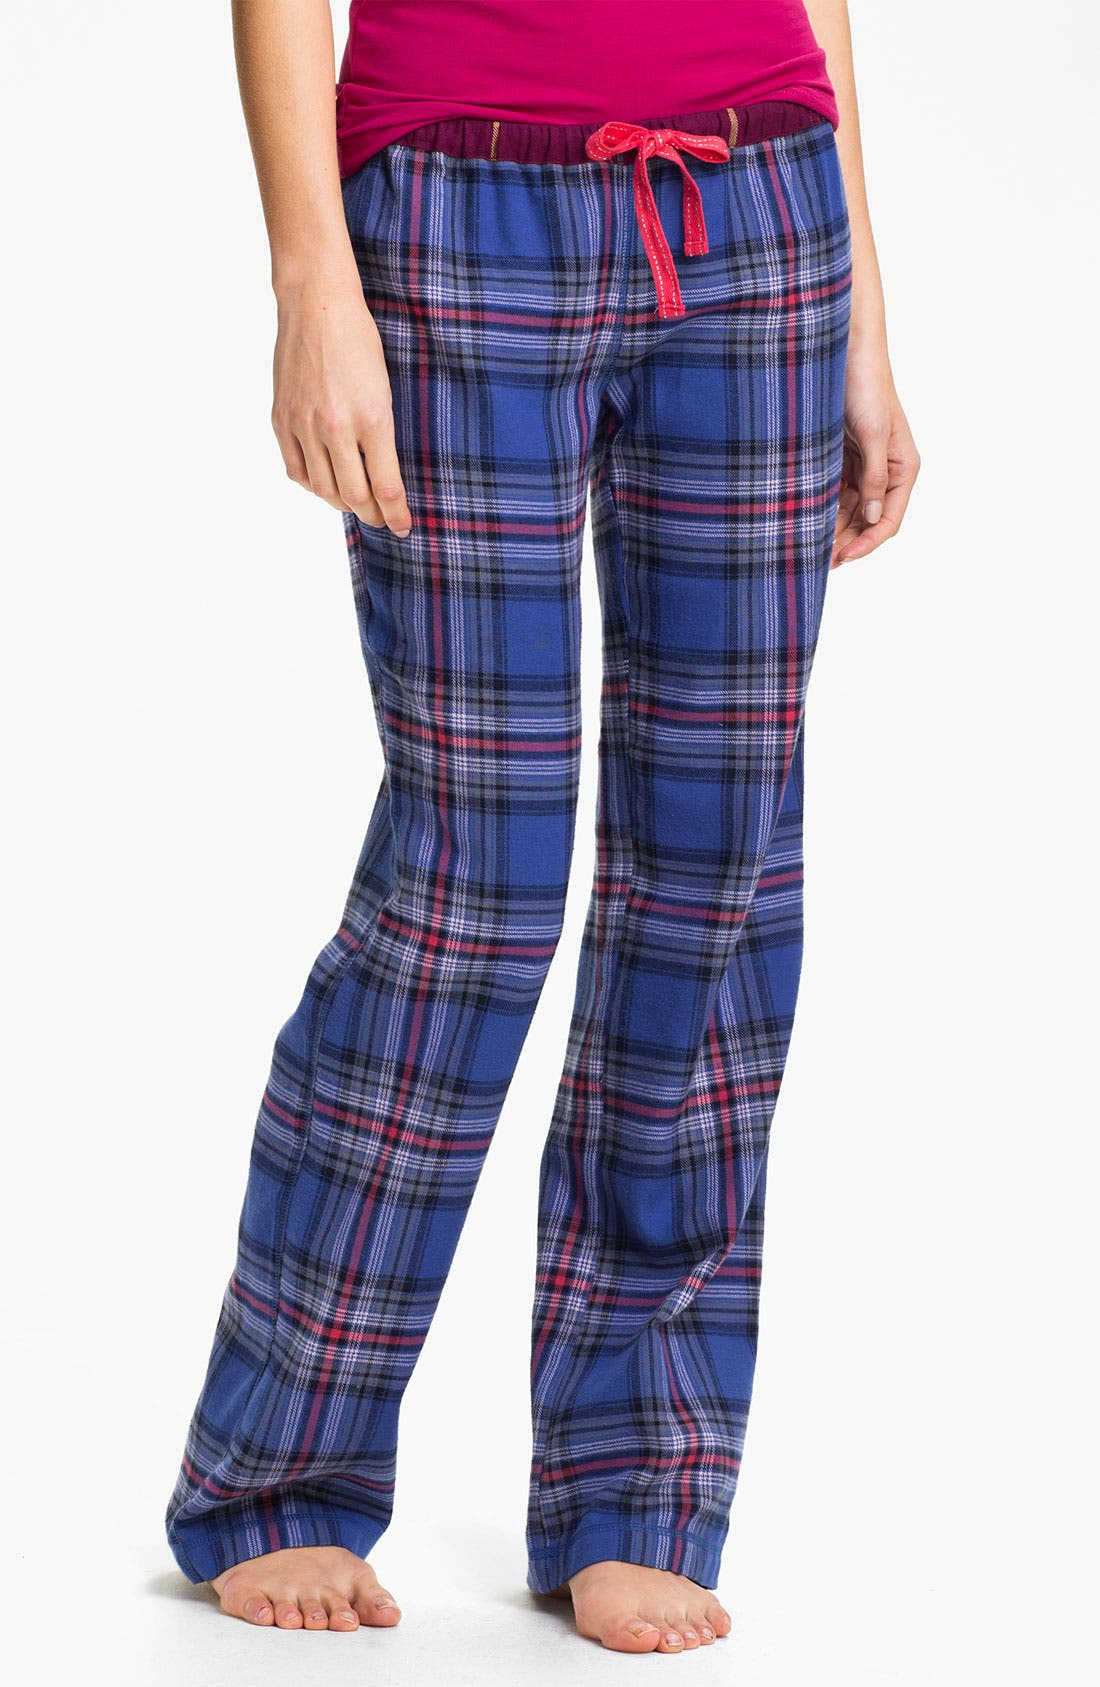 Alternate Image 1 Selected - BP. 'Union' Flannel Lounge Pants (Juniors)